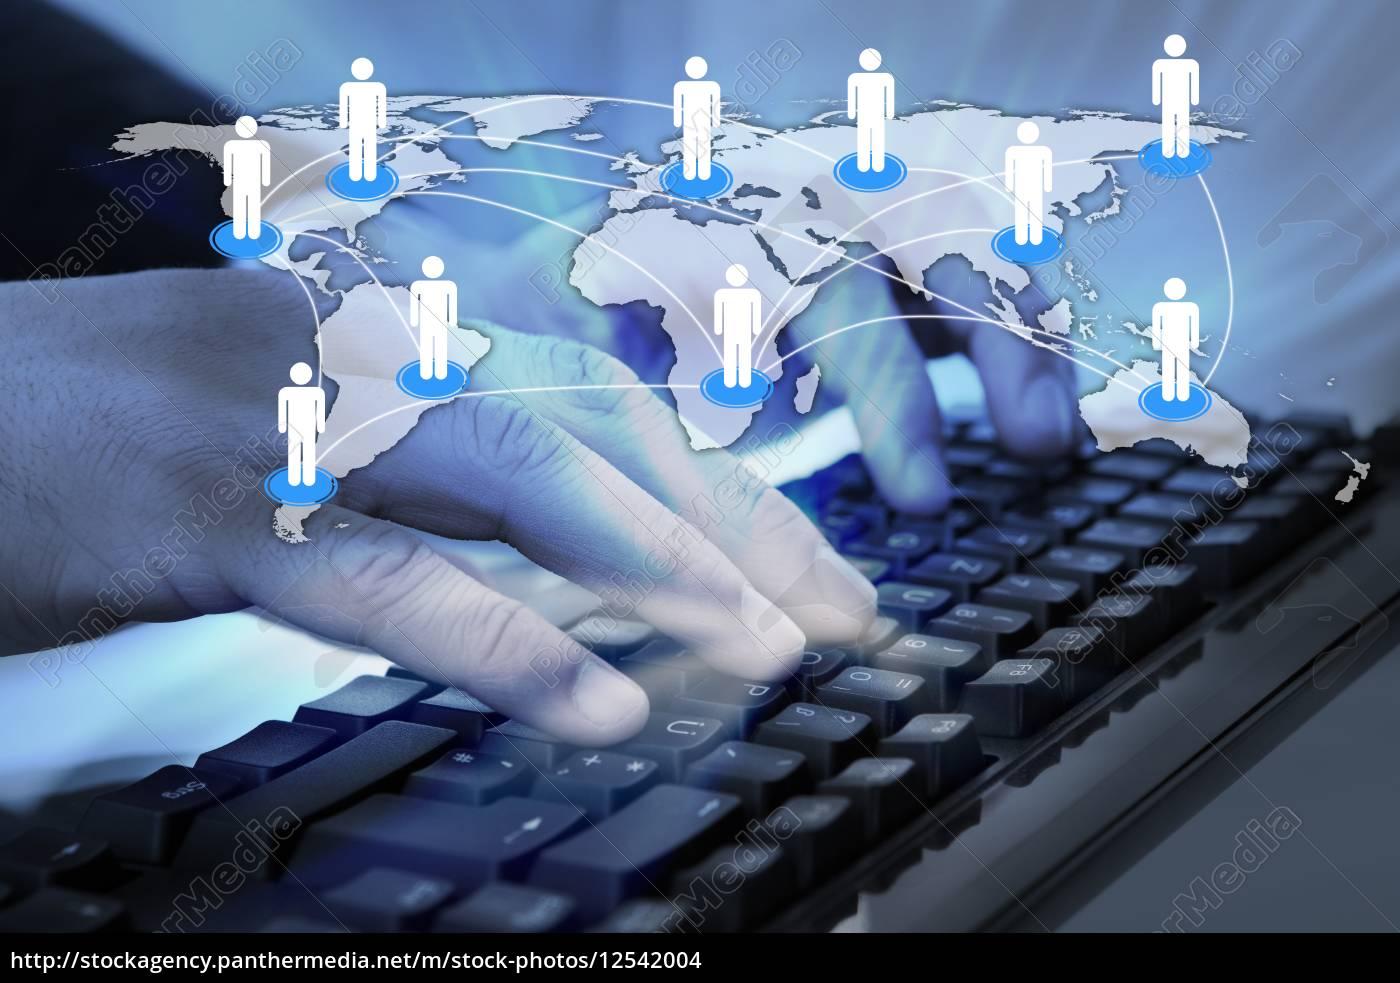 businessman, using, computer, keyboard, at, desk - 12542004